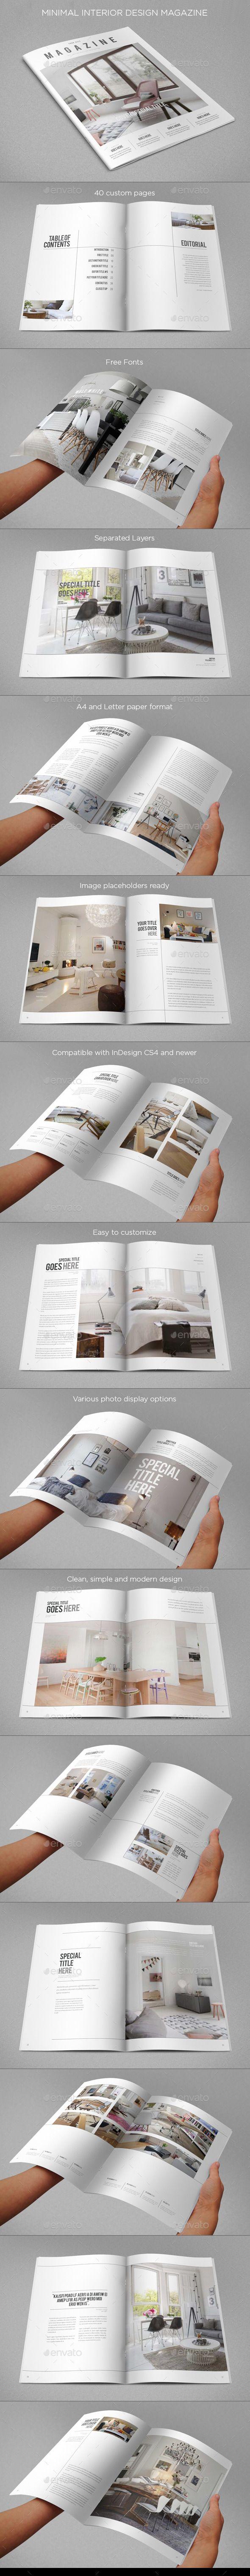 Minimal Interior Design Magazine Template   Download: http://graphicriver.net/item/minimal-interior-design-magazine/9499179?ref=ksioks